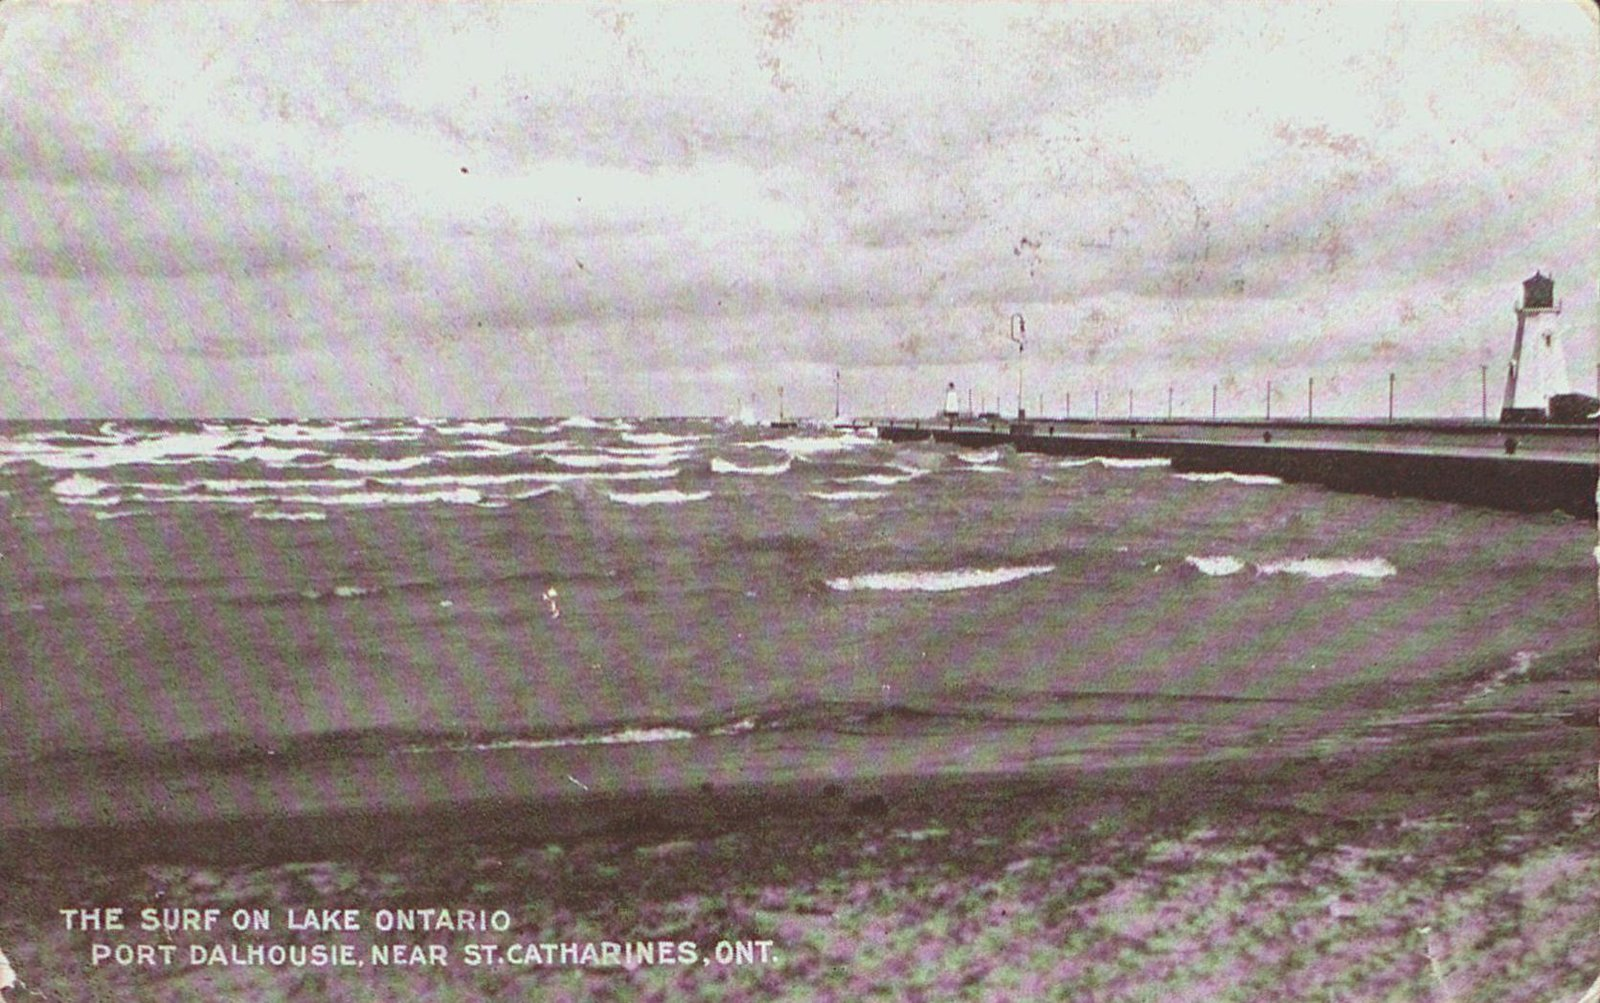 The Surf on Lake Ontario at Port Dalhousie